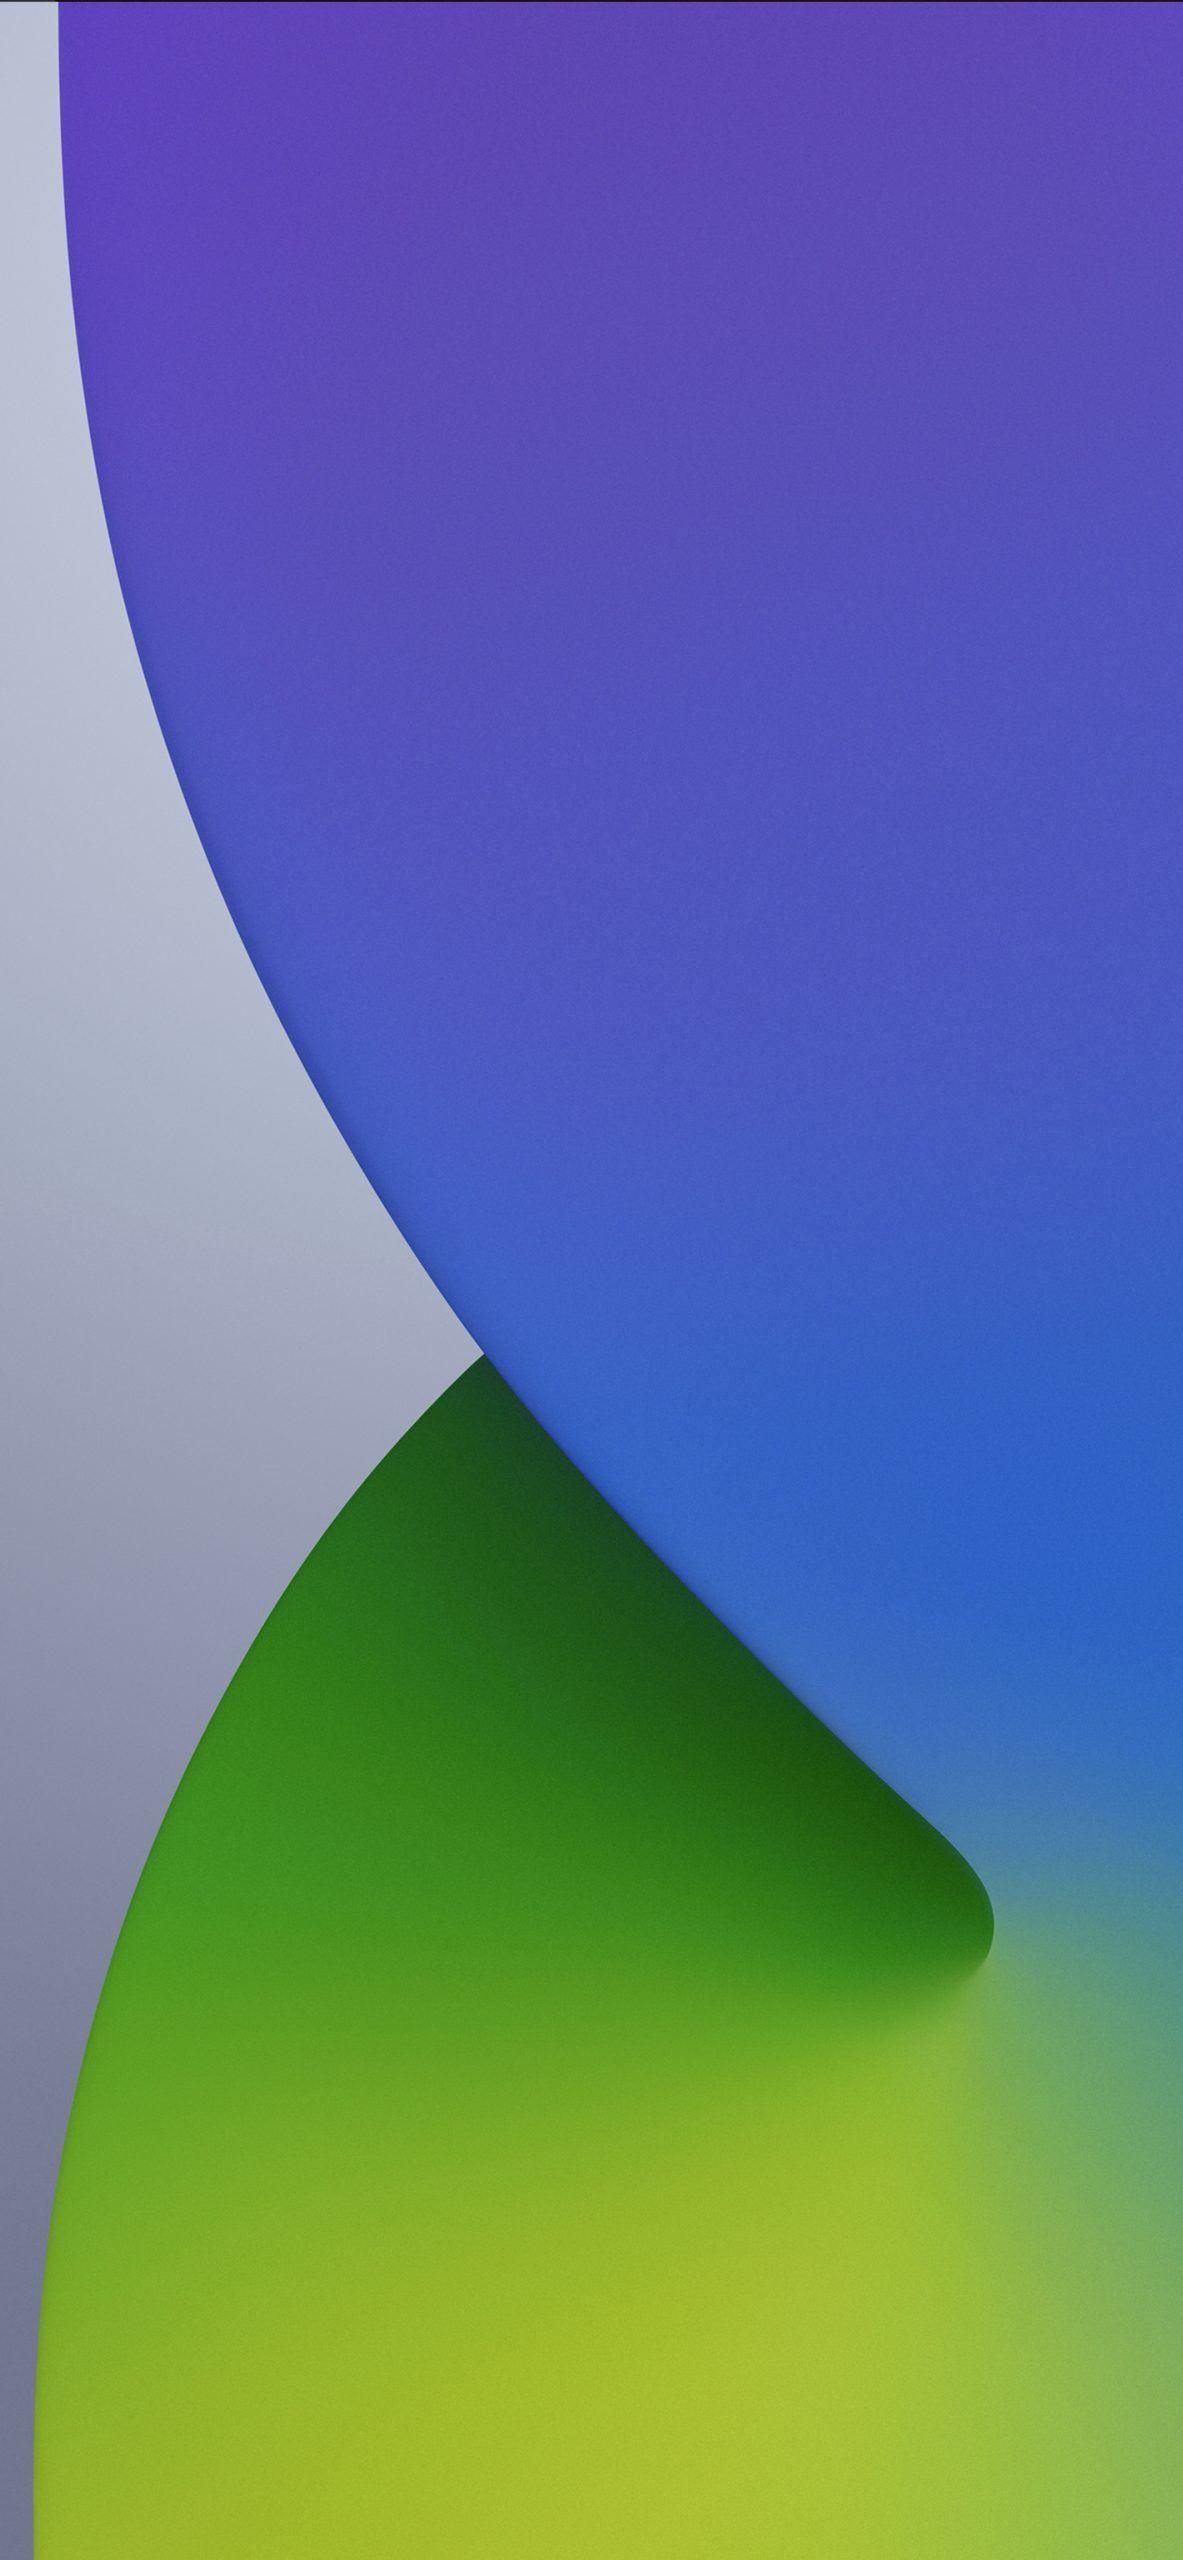 Ios14 Green Abstract Iphone Wallpaper Apple Logo Wallpaper Iphone Wallpaper Display